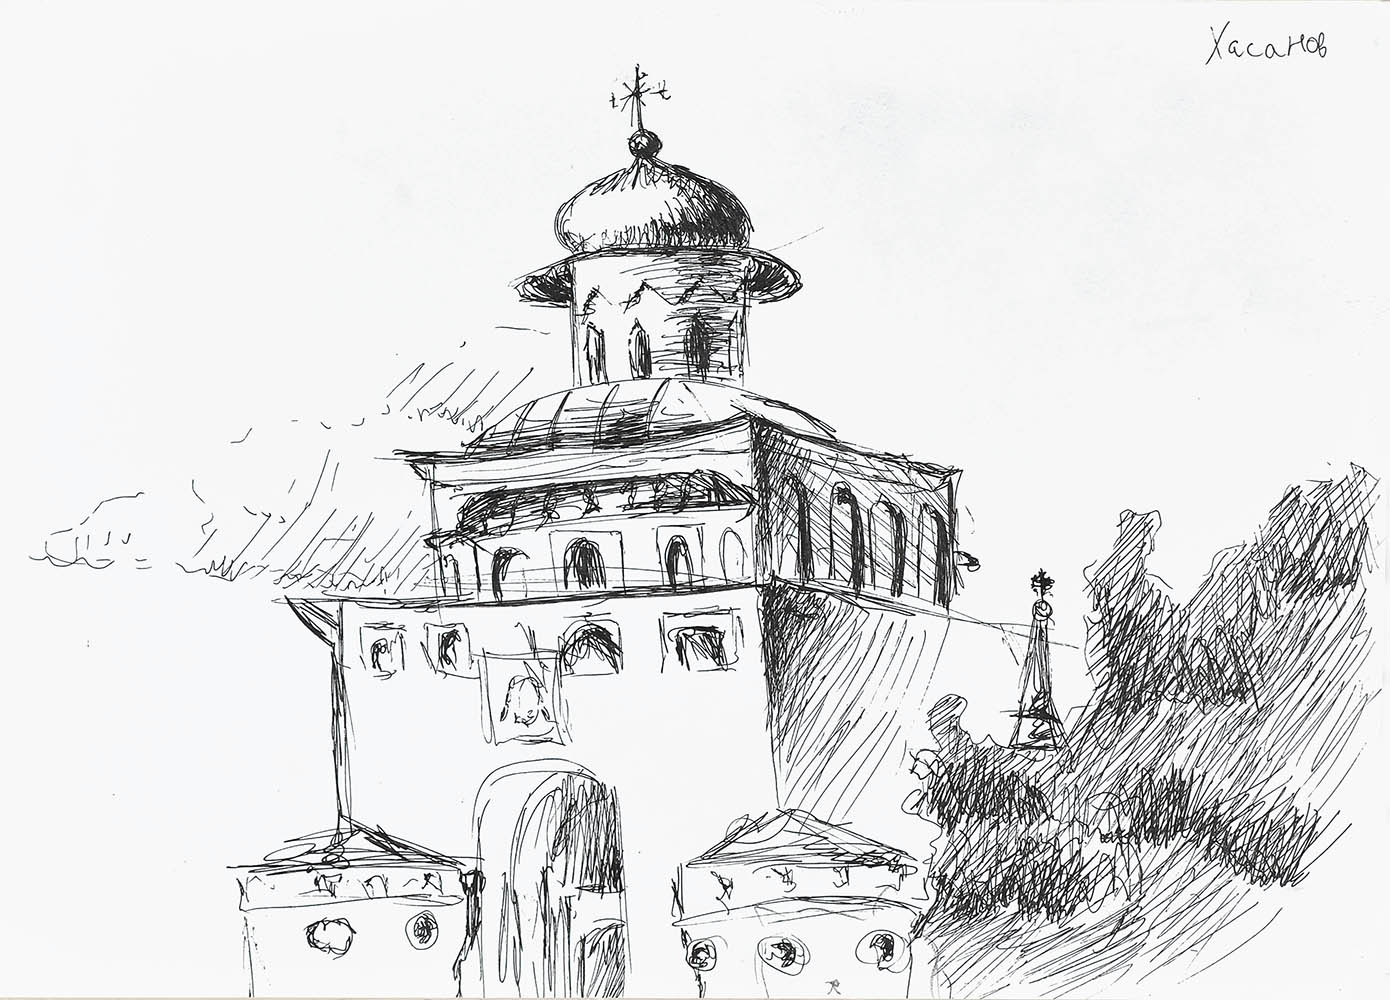 ДШИ №13 Ижевск Пленэр